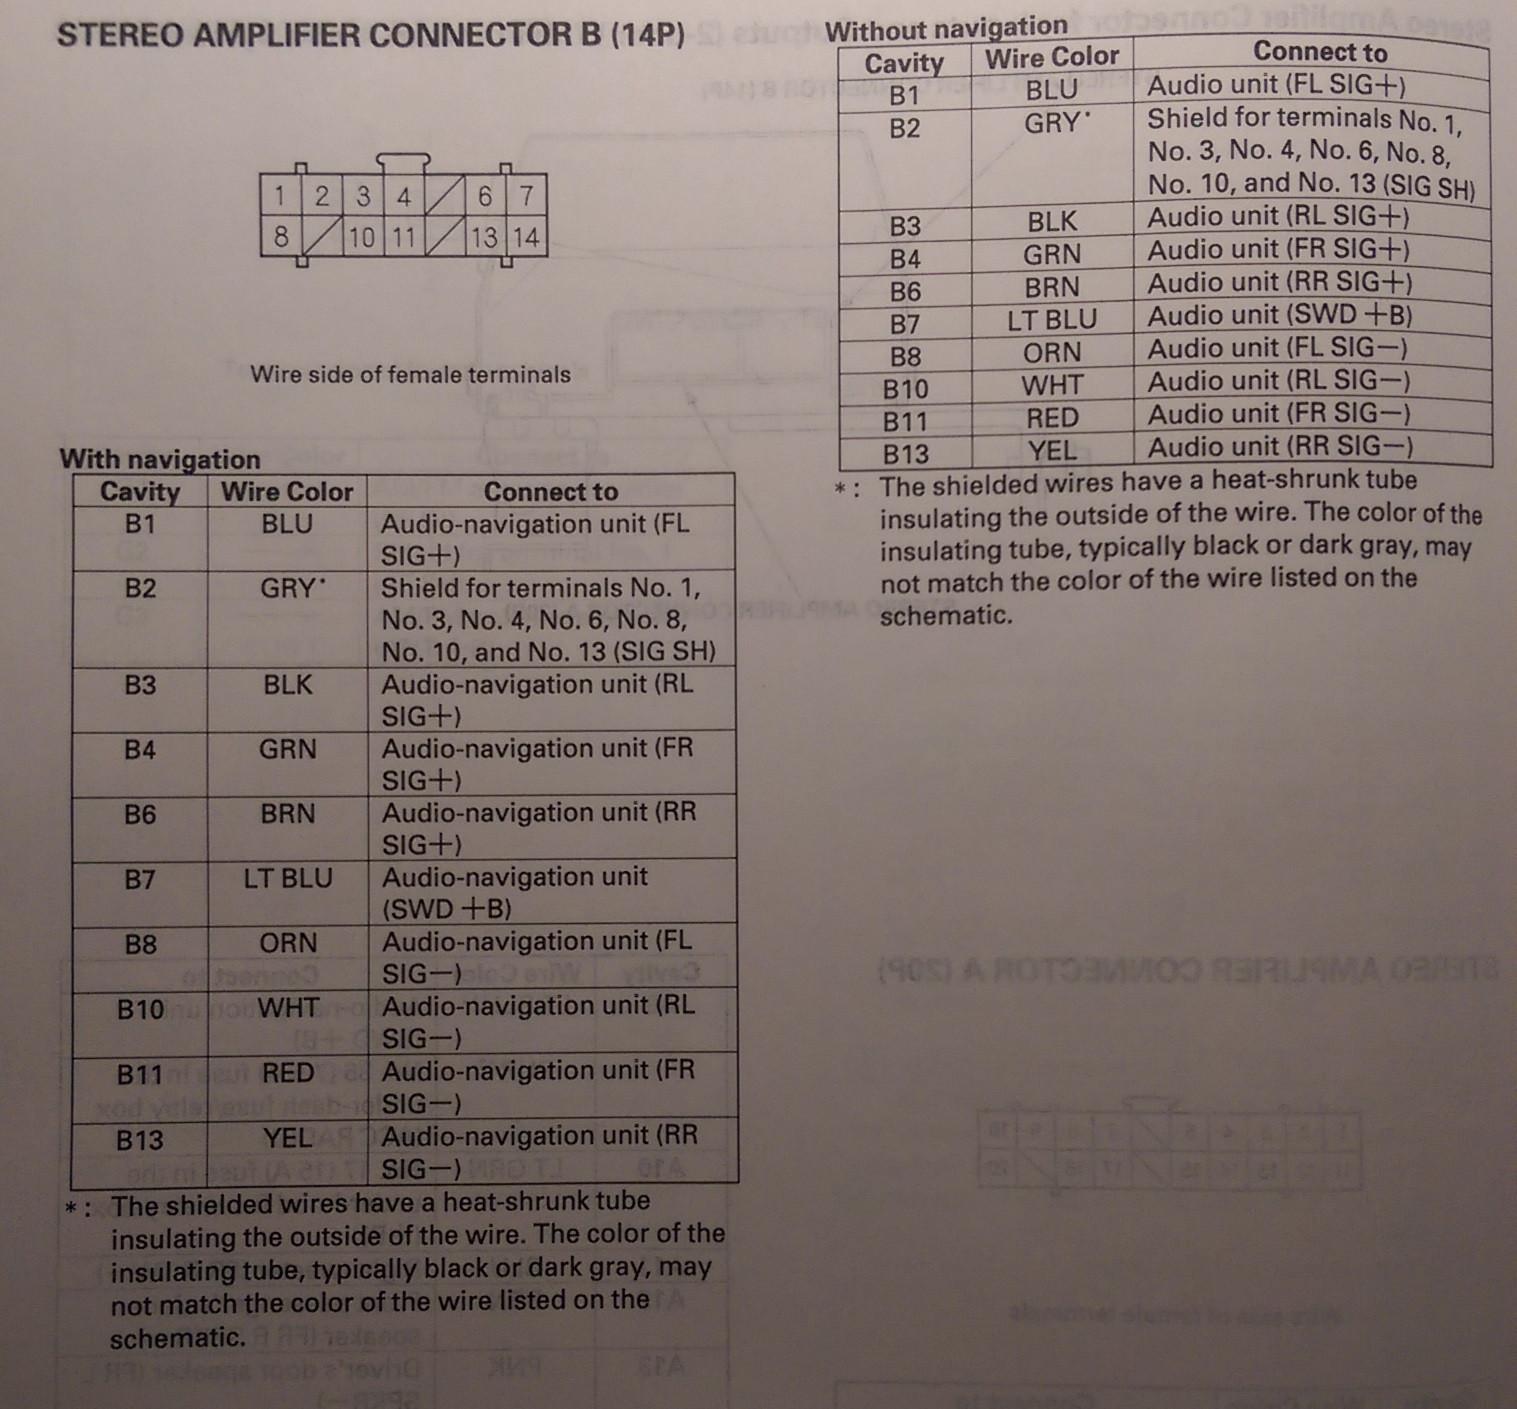 Honda Civic Wiring Diagram On Wiring Diagram For Honda Civic 2001